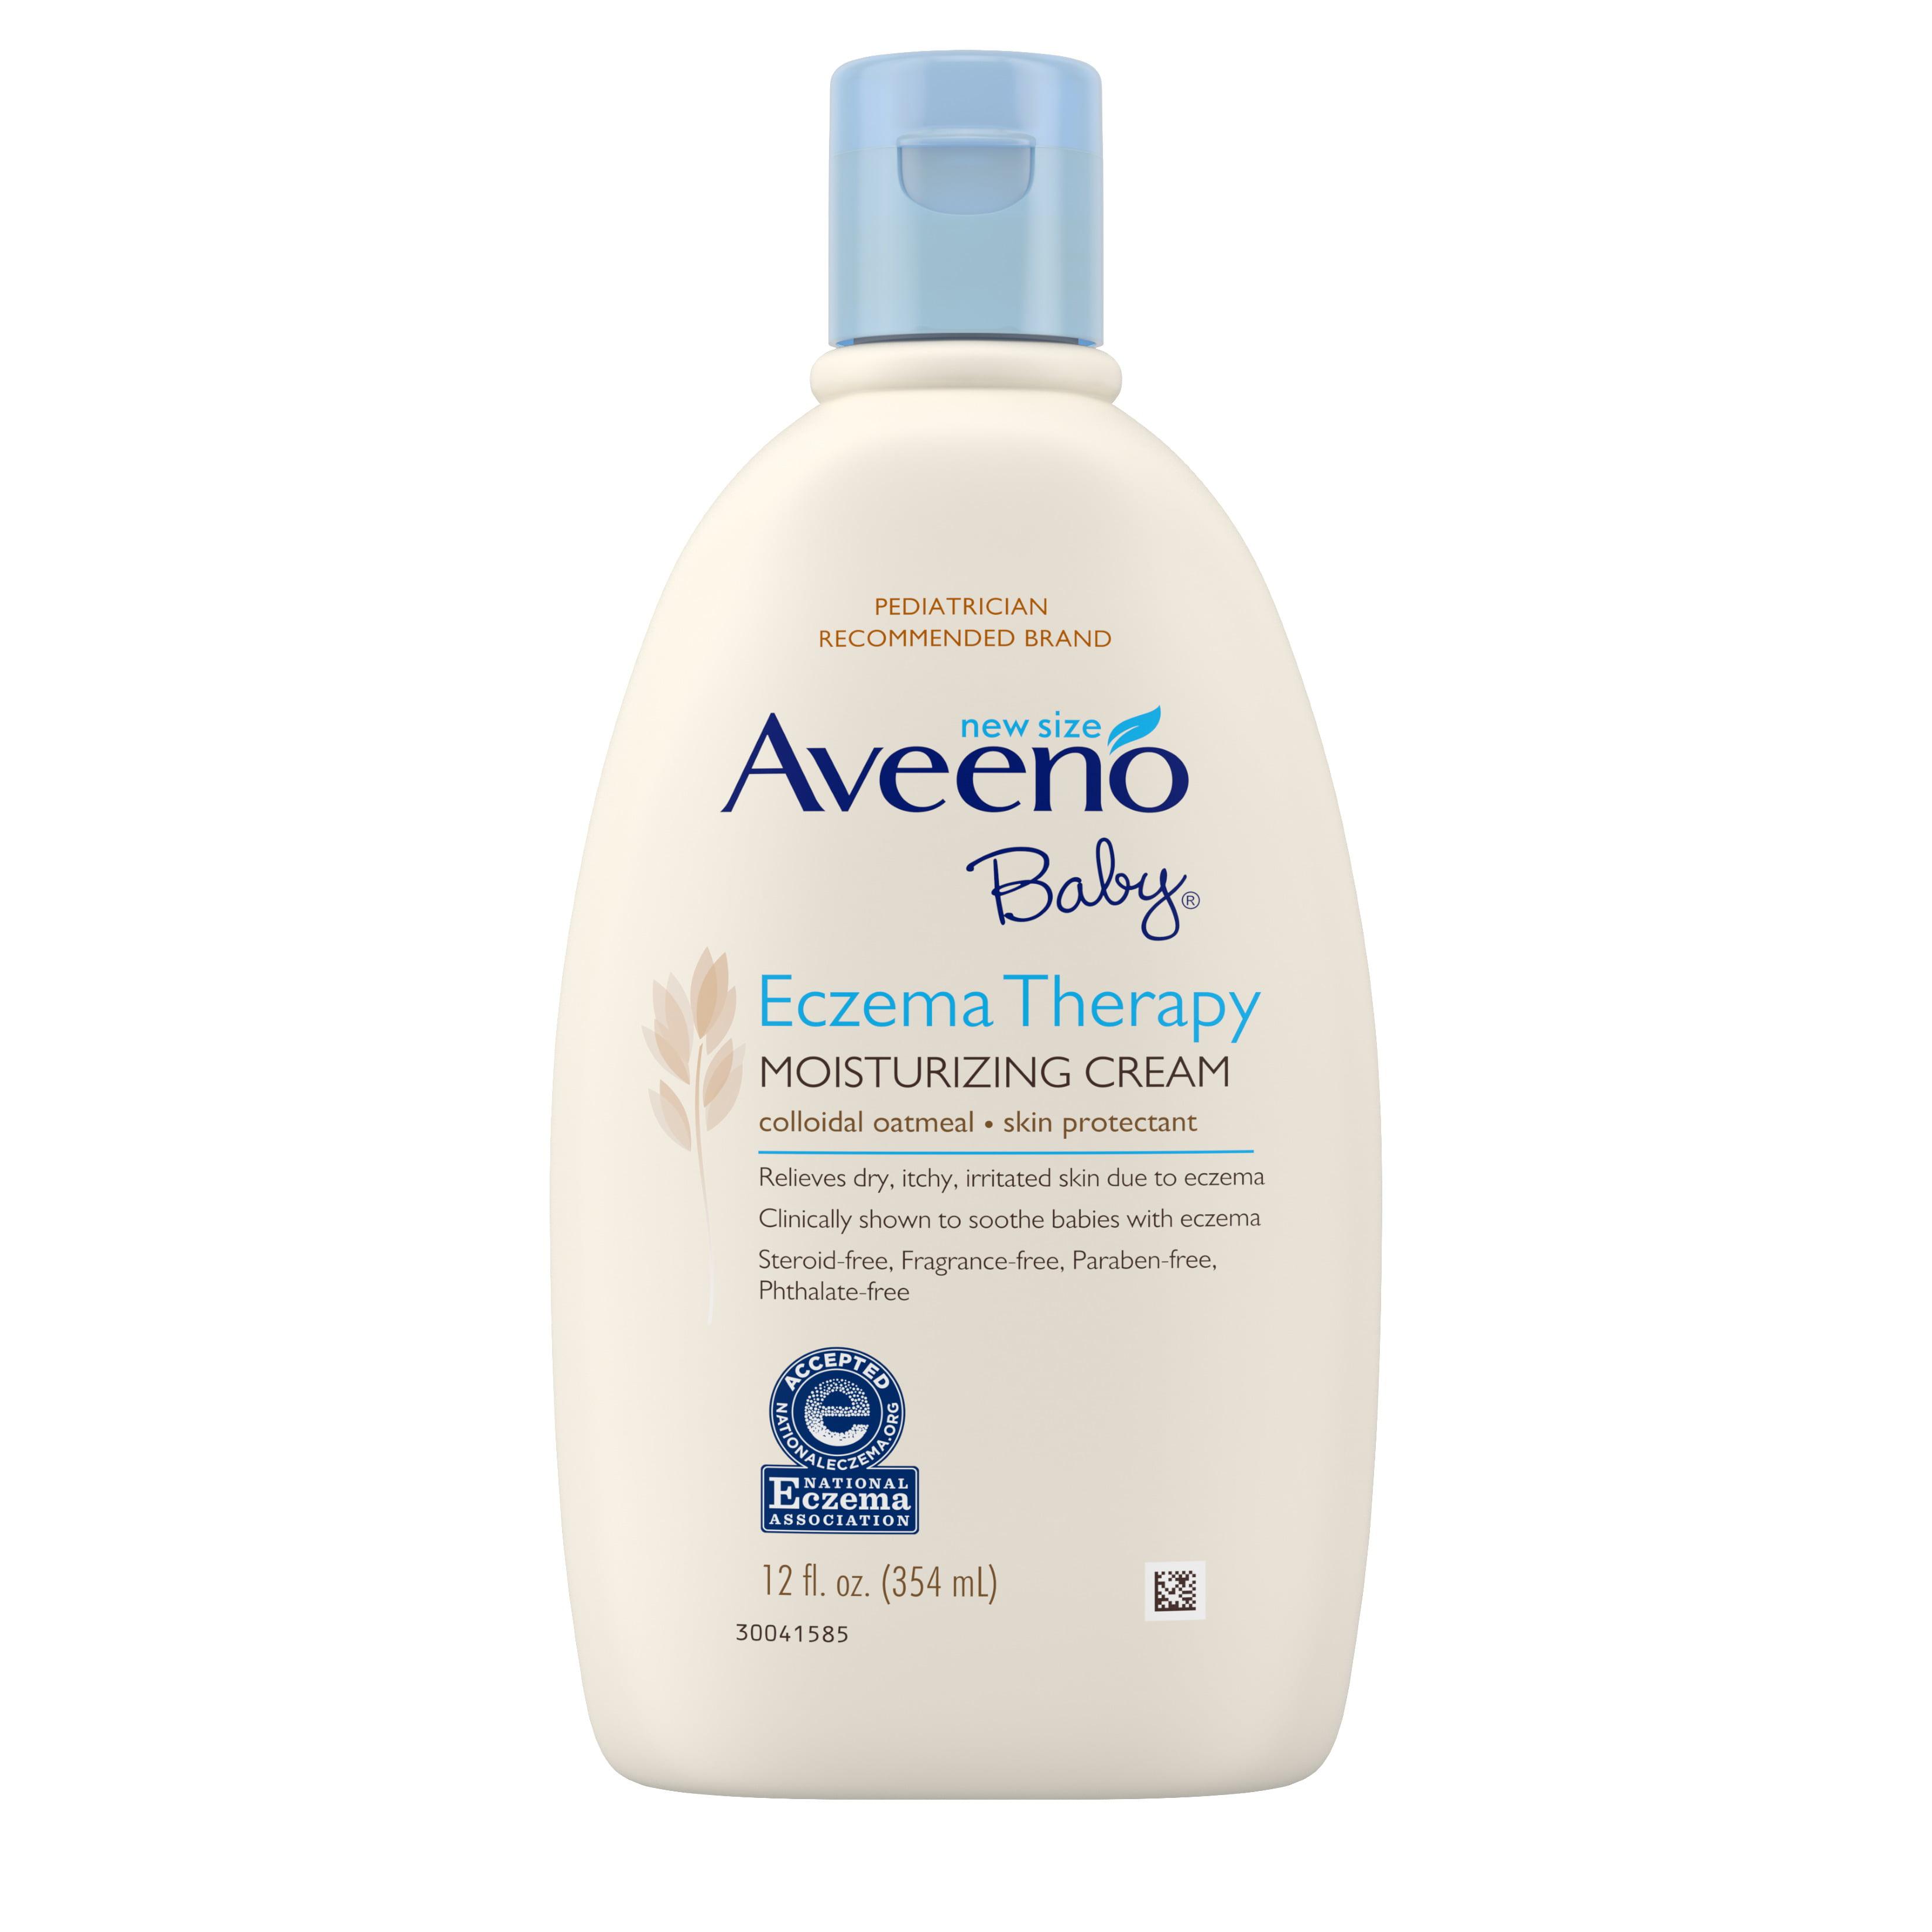 Aveeno Baby Eczema Therapy Moisturizing Cream with Natural Oatmeal, 12 fl. oz